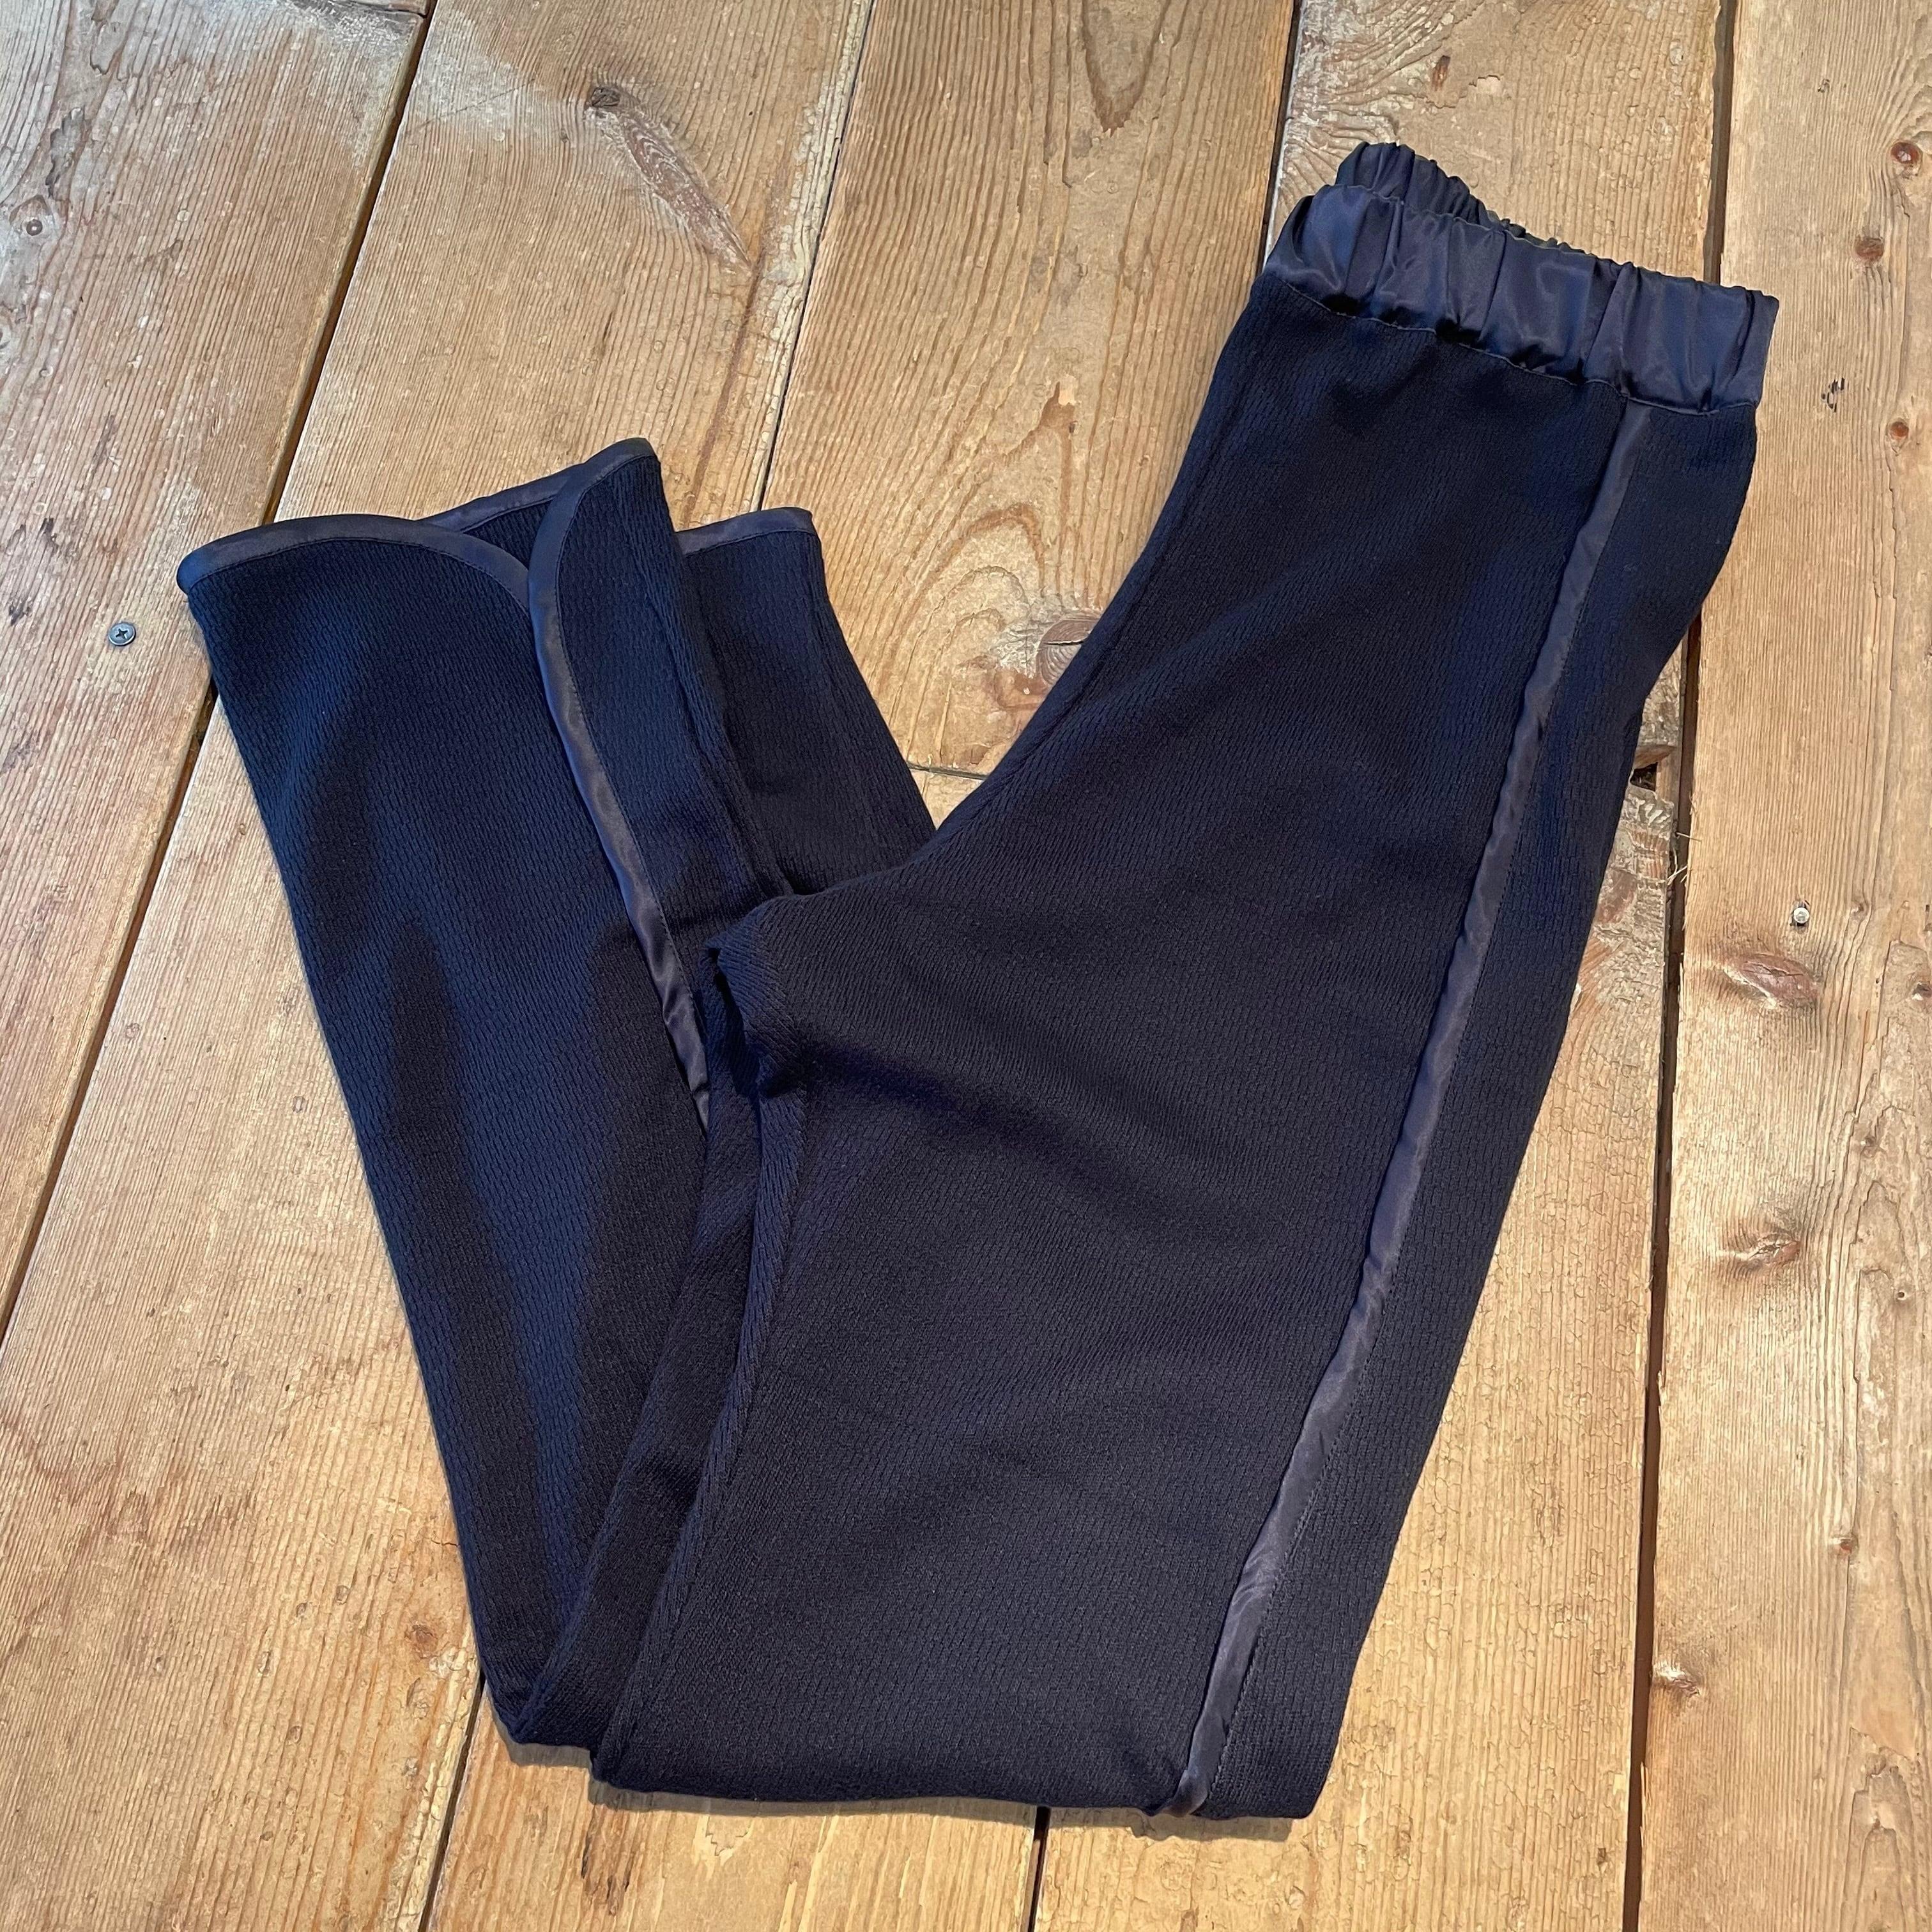 【RehersalL】military waffle slit leggings(navy)/【リハーズオール】ミリタリーワッフルスリットレギンス(ネービー)